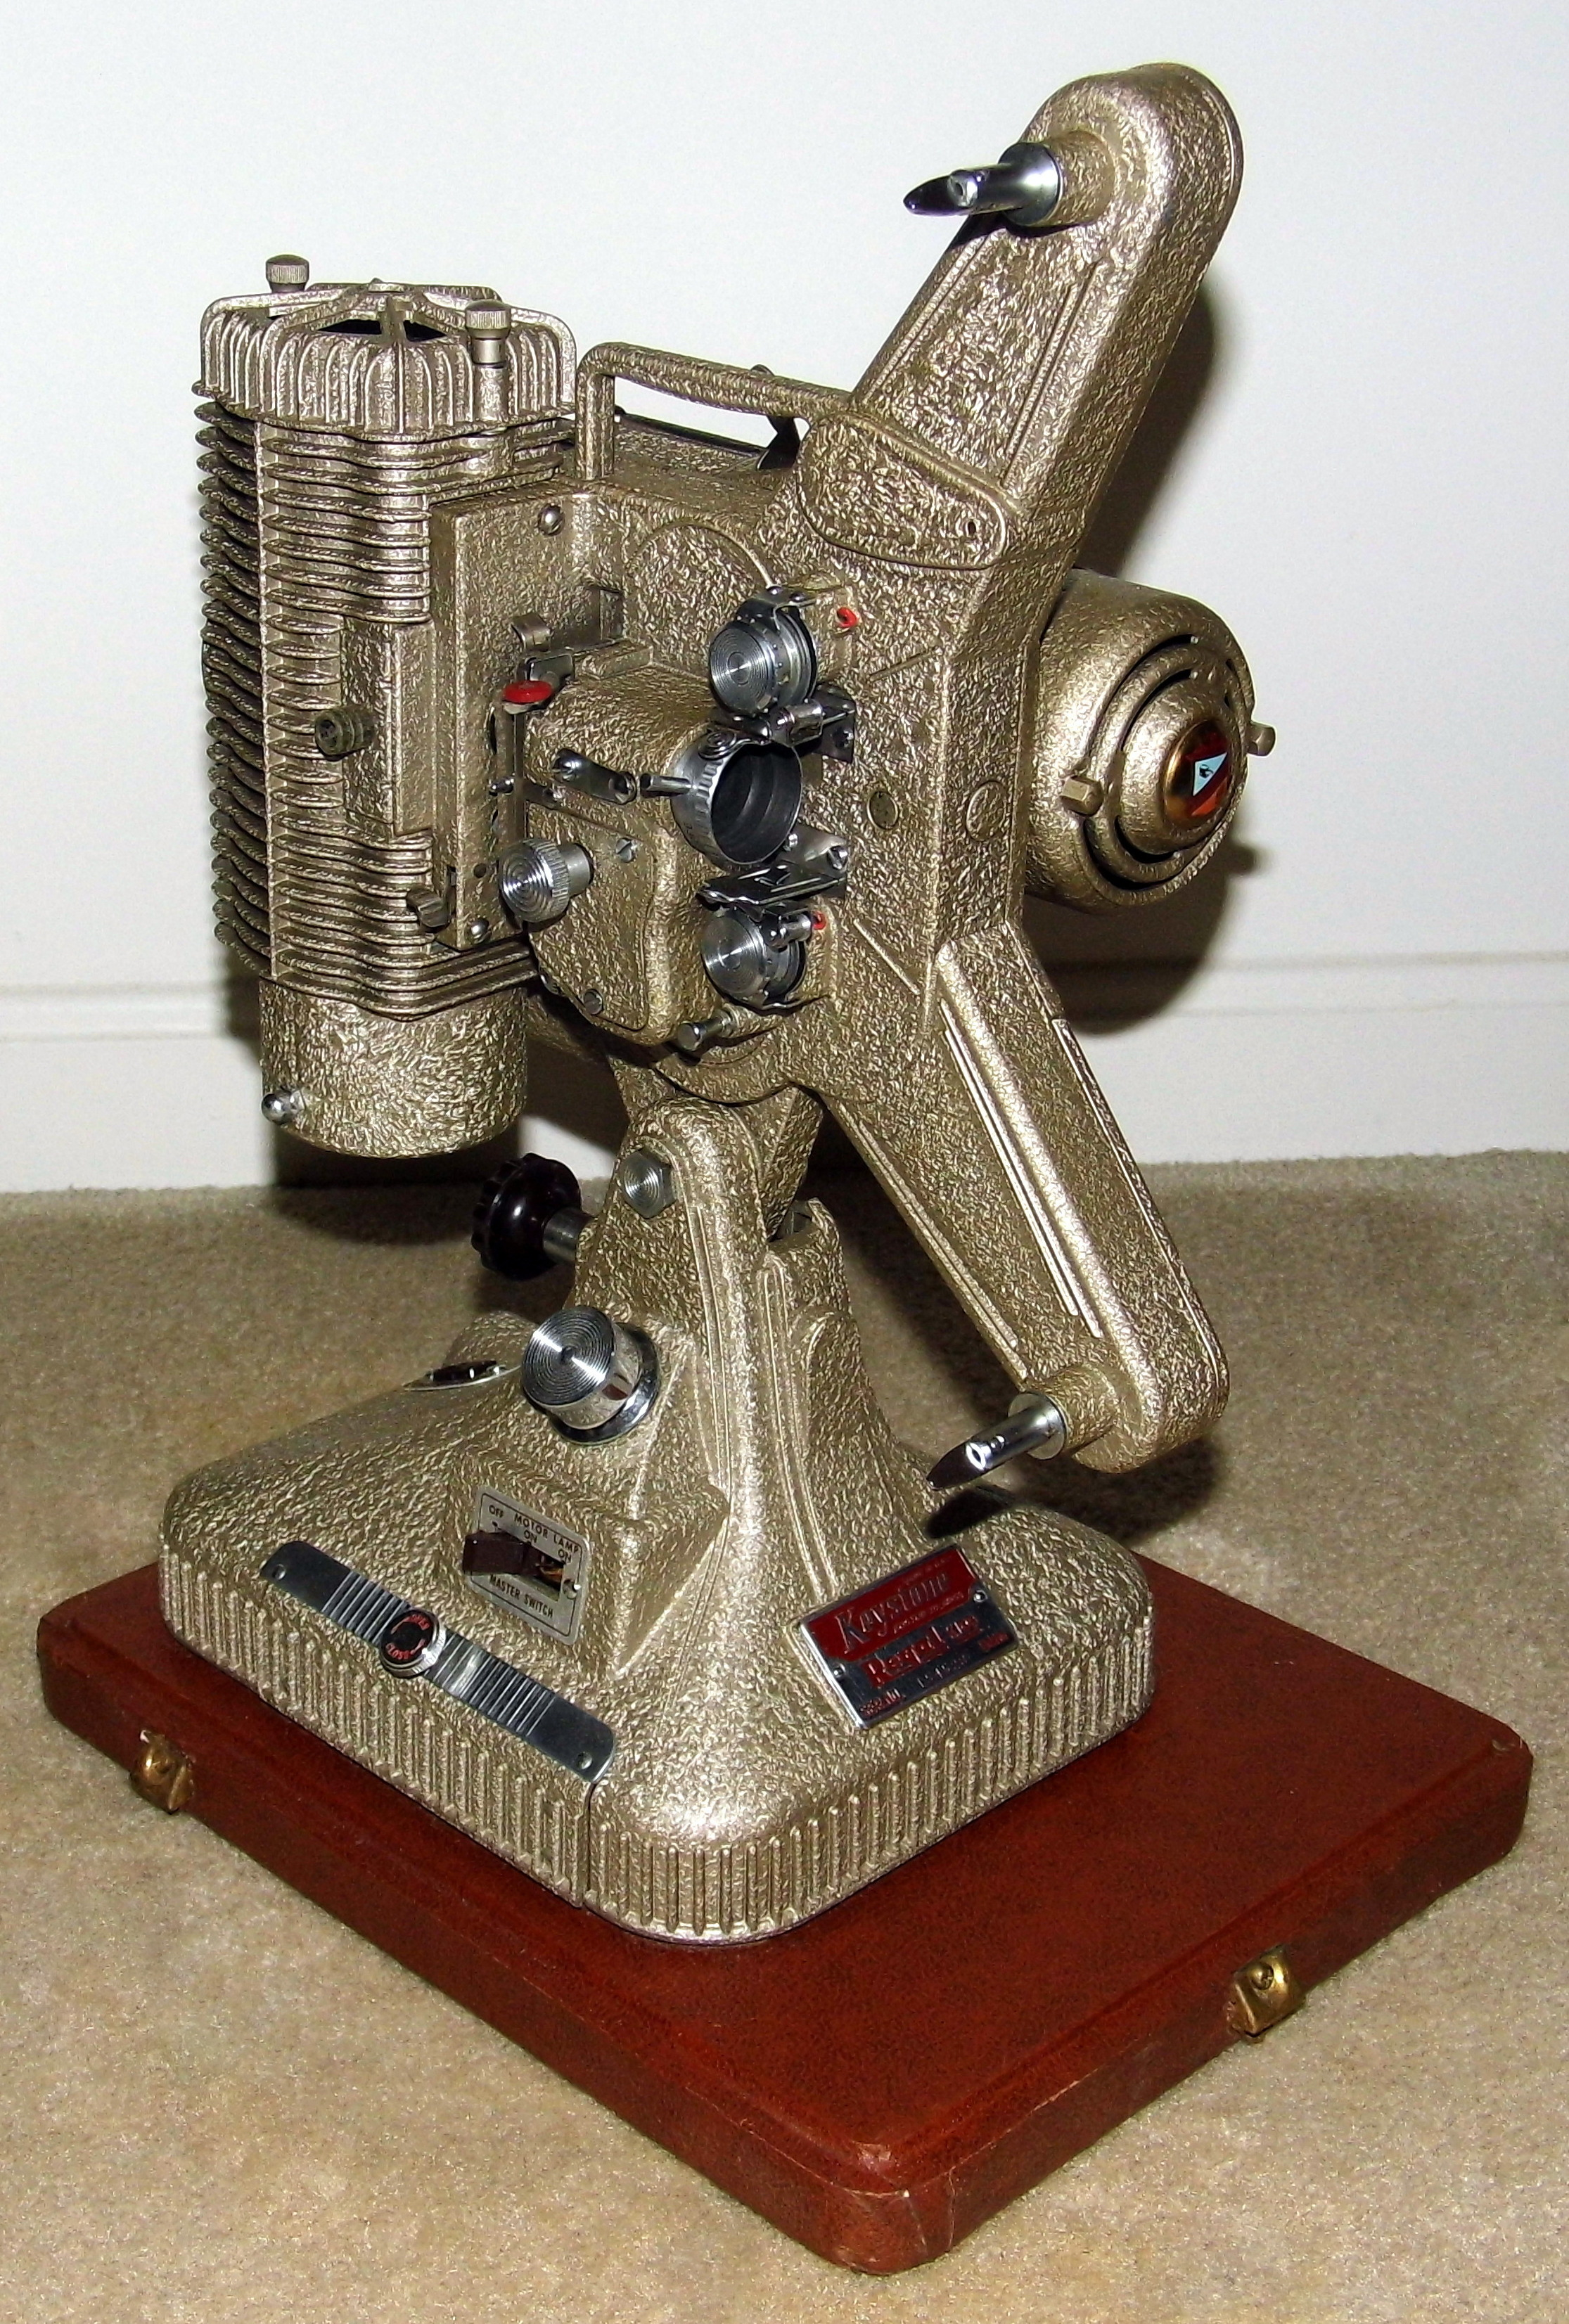 filevintage keystone regal 8mm movie projector model